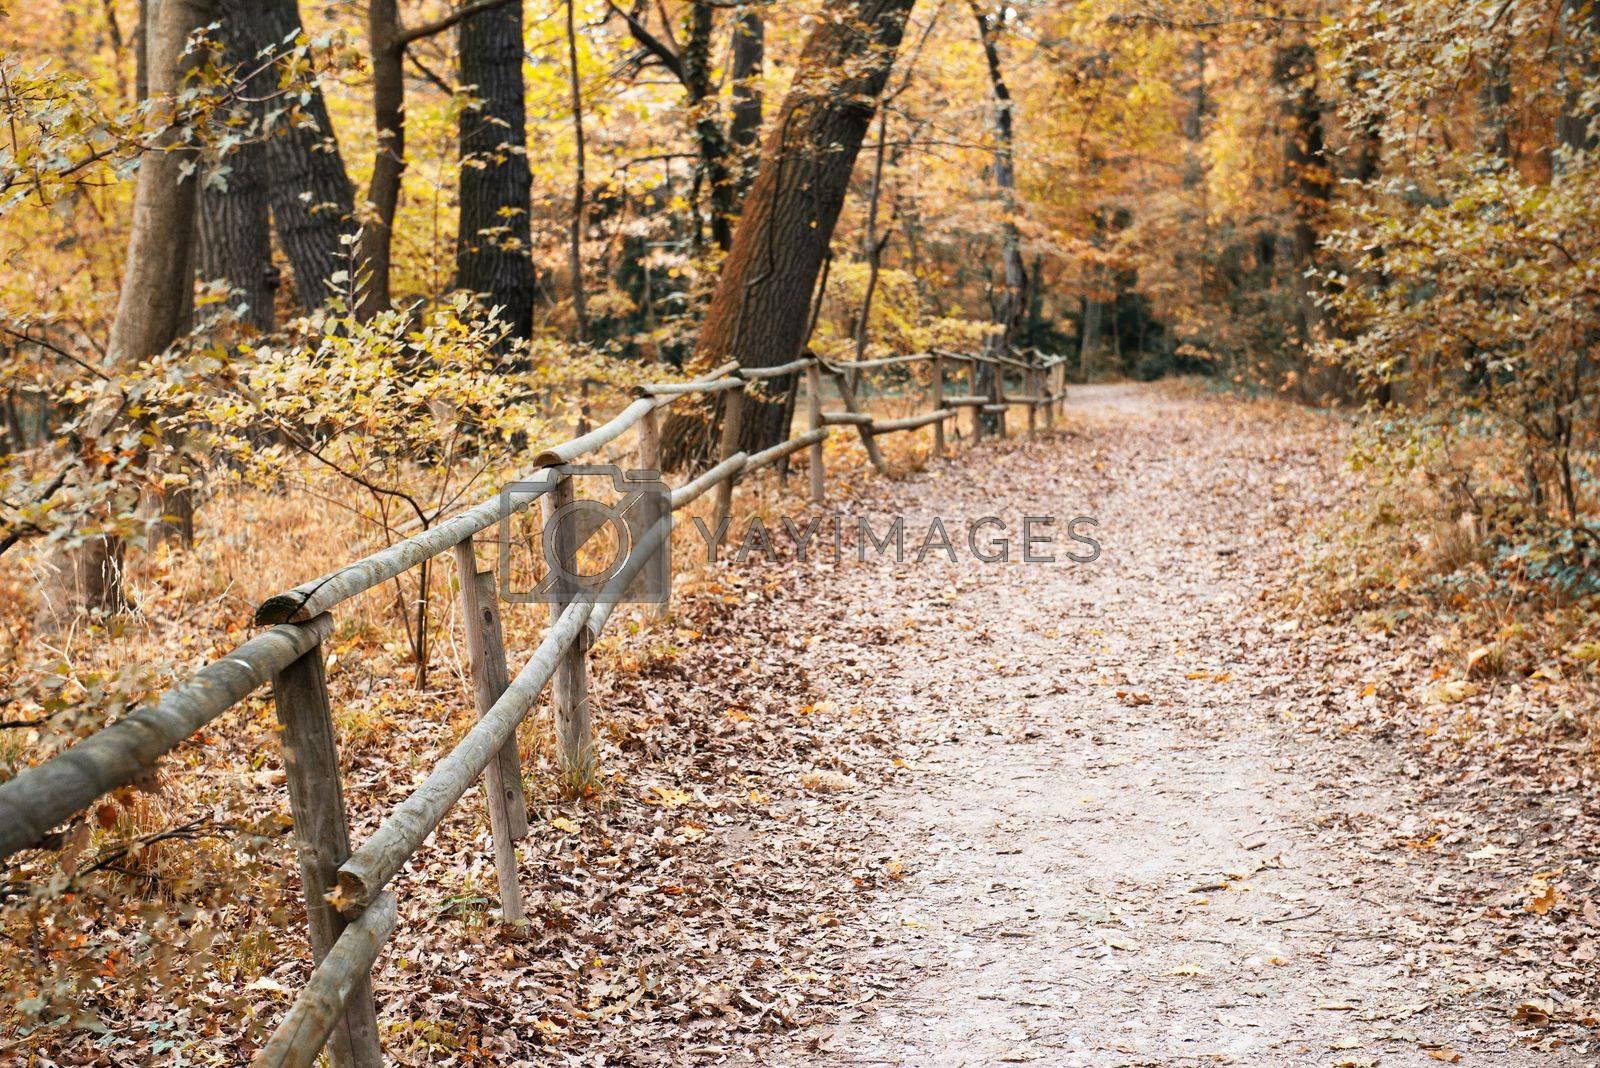 forest trail in autumn season